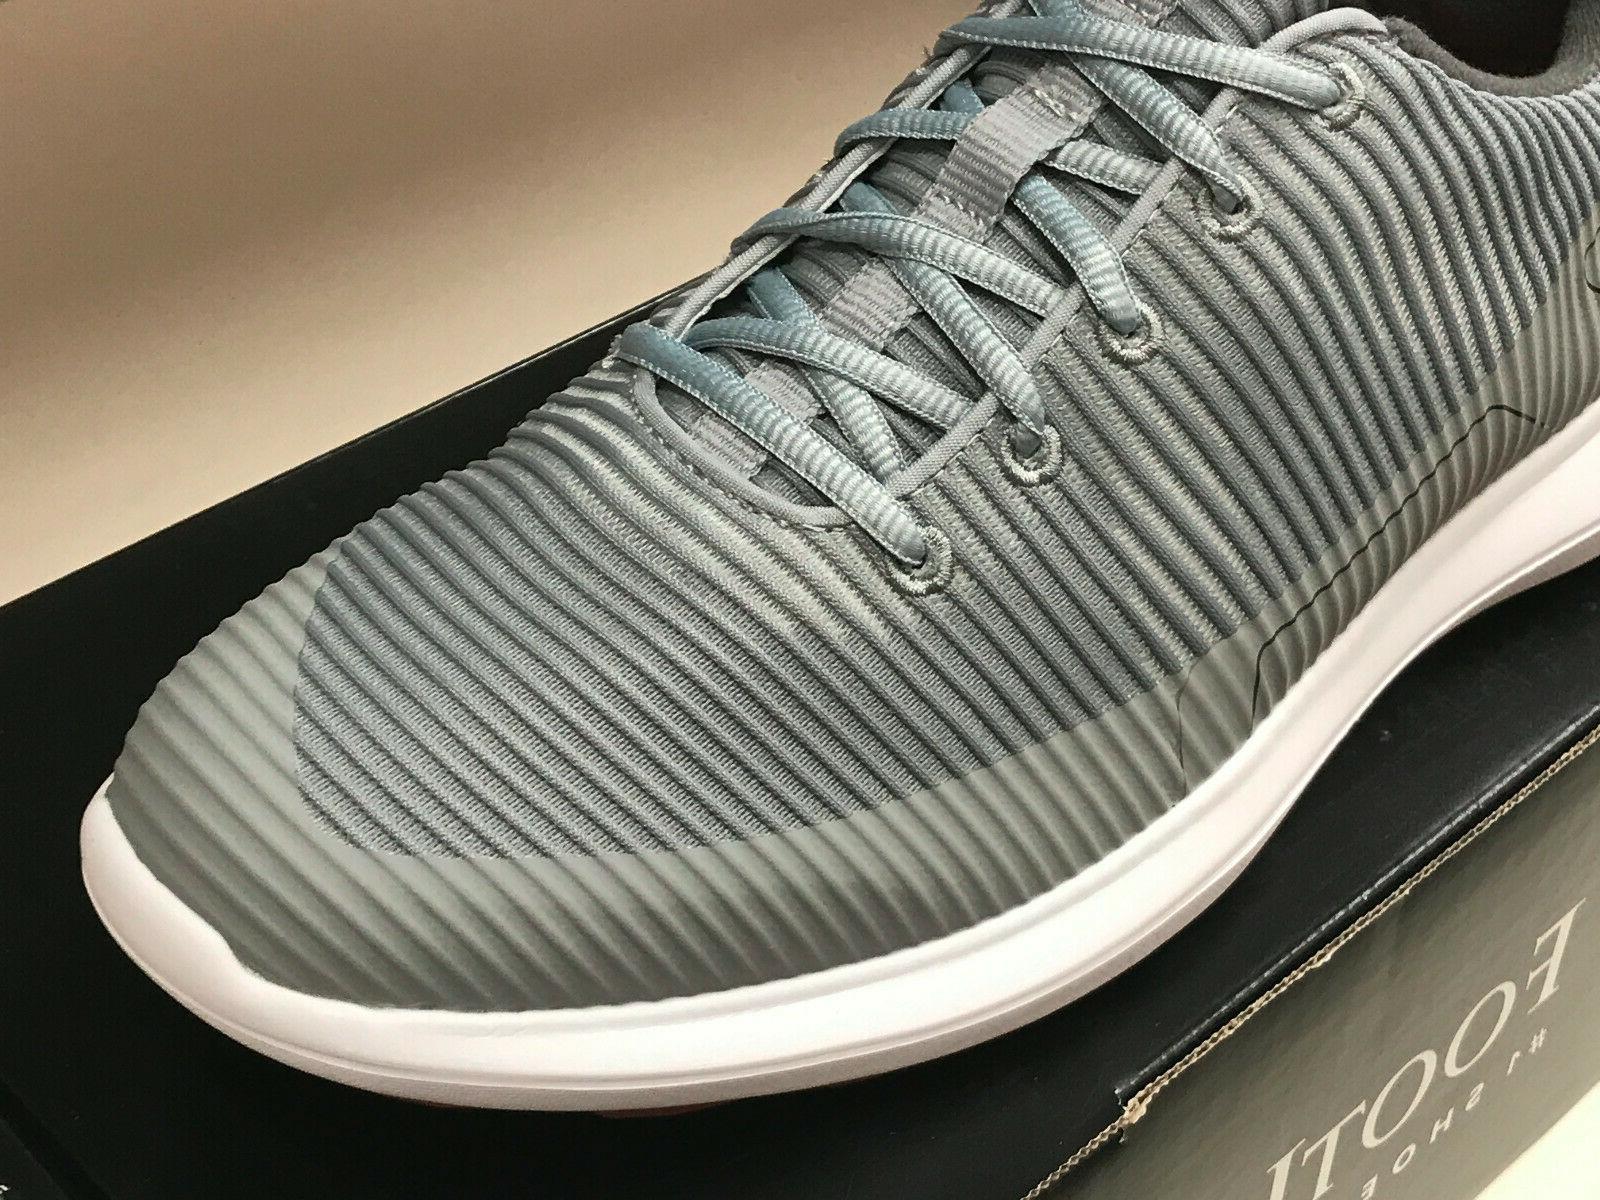 FootJoy Golf Shoes 56251 Grey WATERPROOF Were